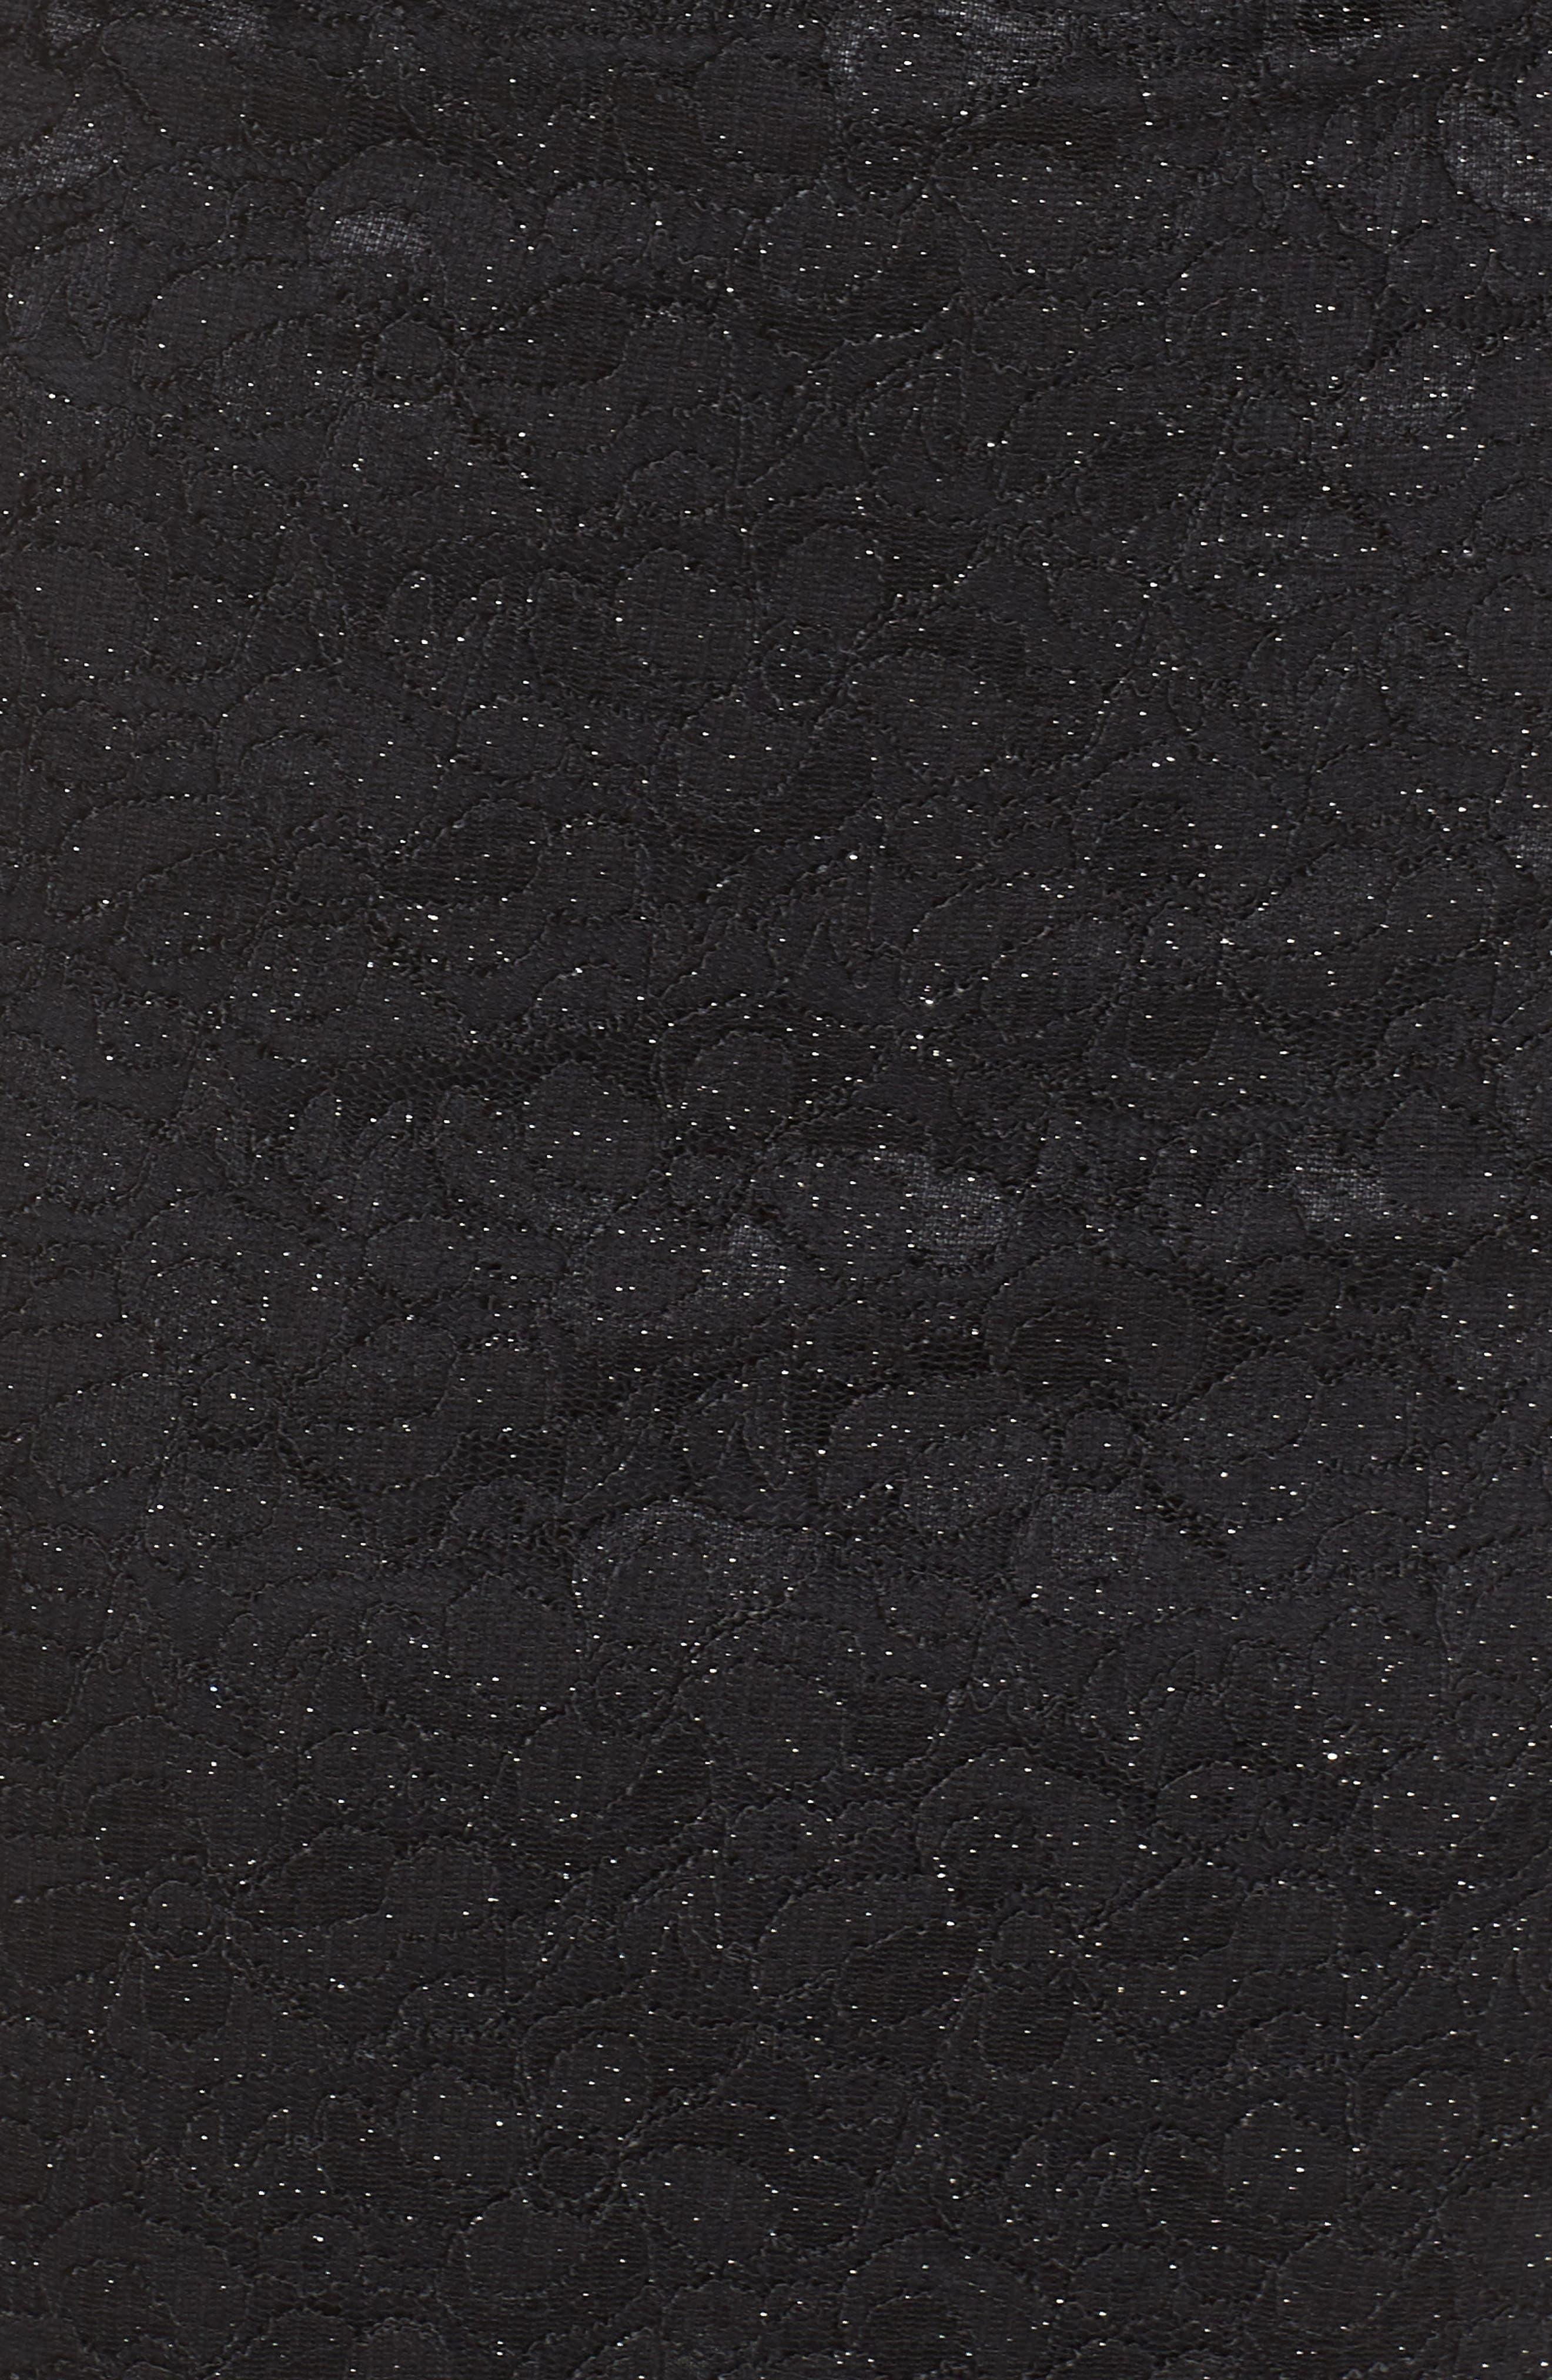 Open Back Glitter Lace Cocktail Sheath,                             Alternate thumbnail 6, color,                             BK BLACK